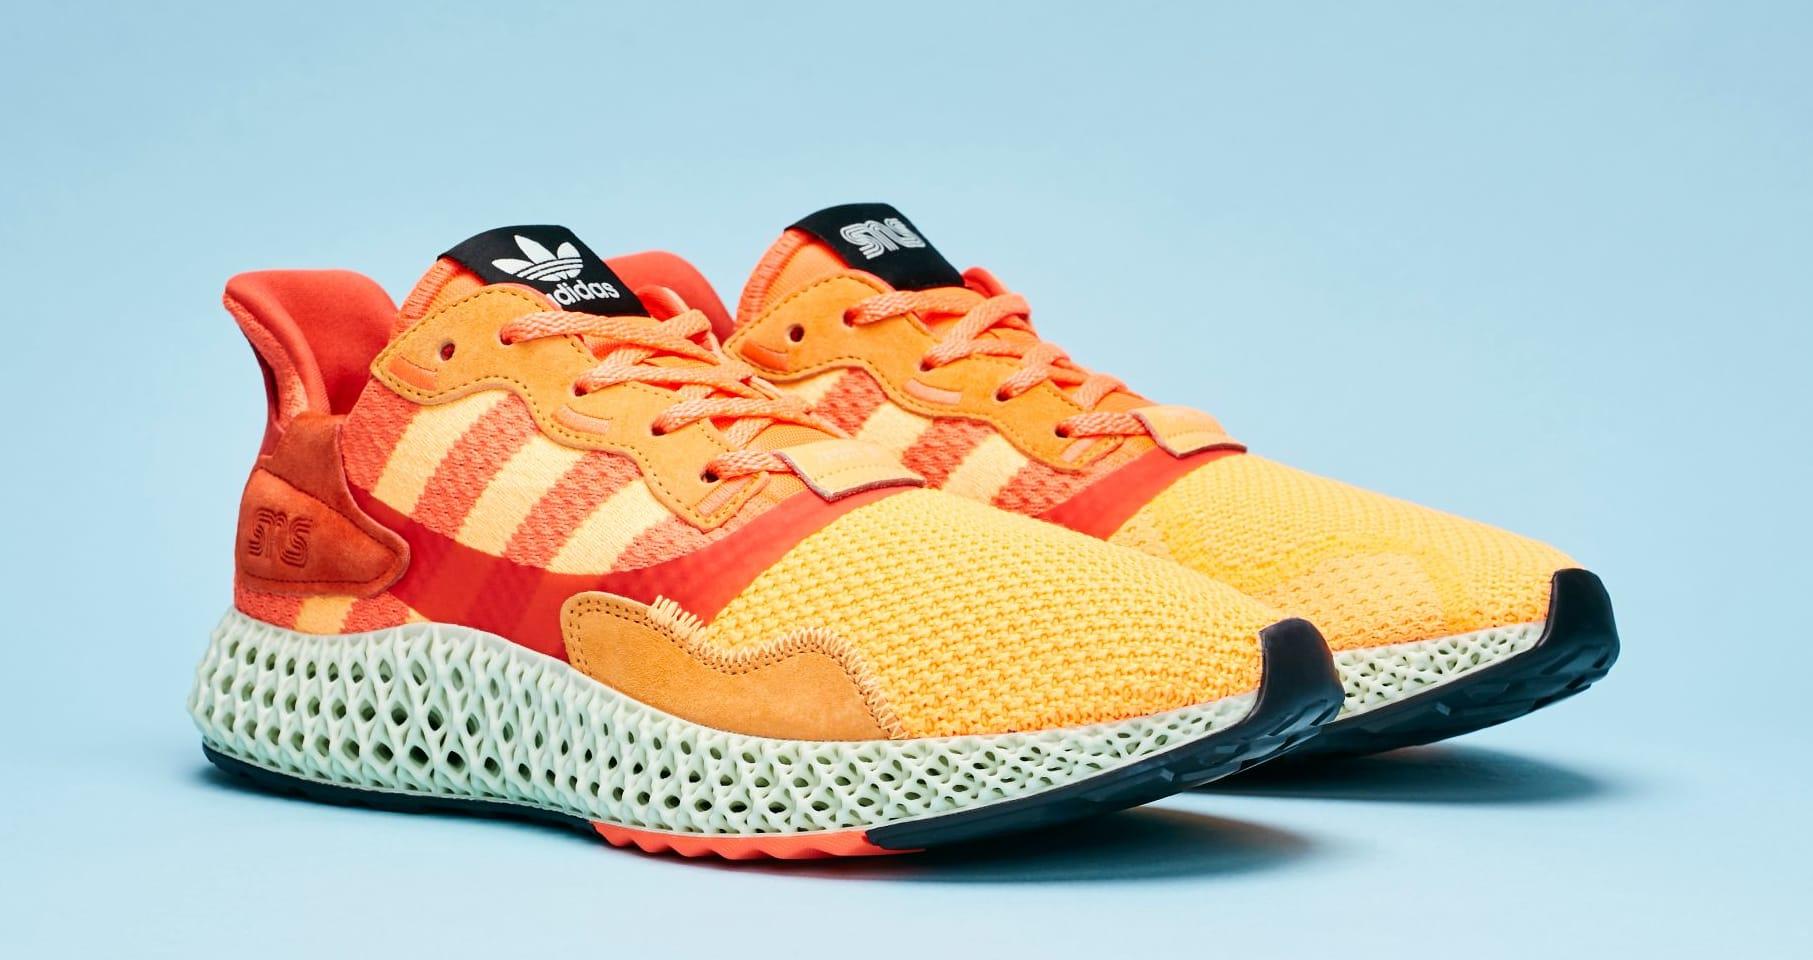 Sneakersnstuff x Adidas Consortium ZX 4000 4D 'Sunrise' (Pair)